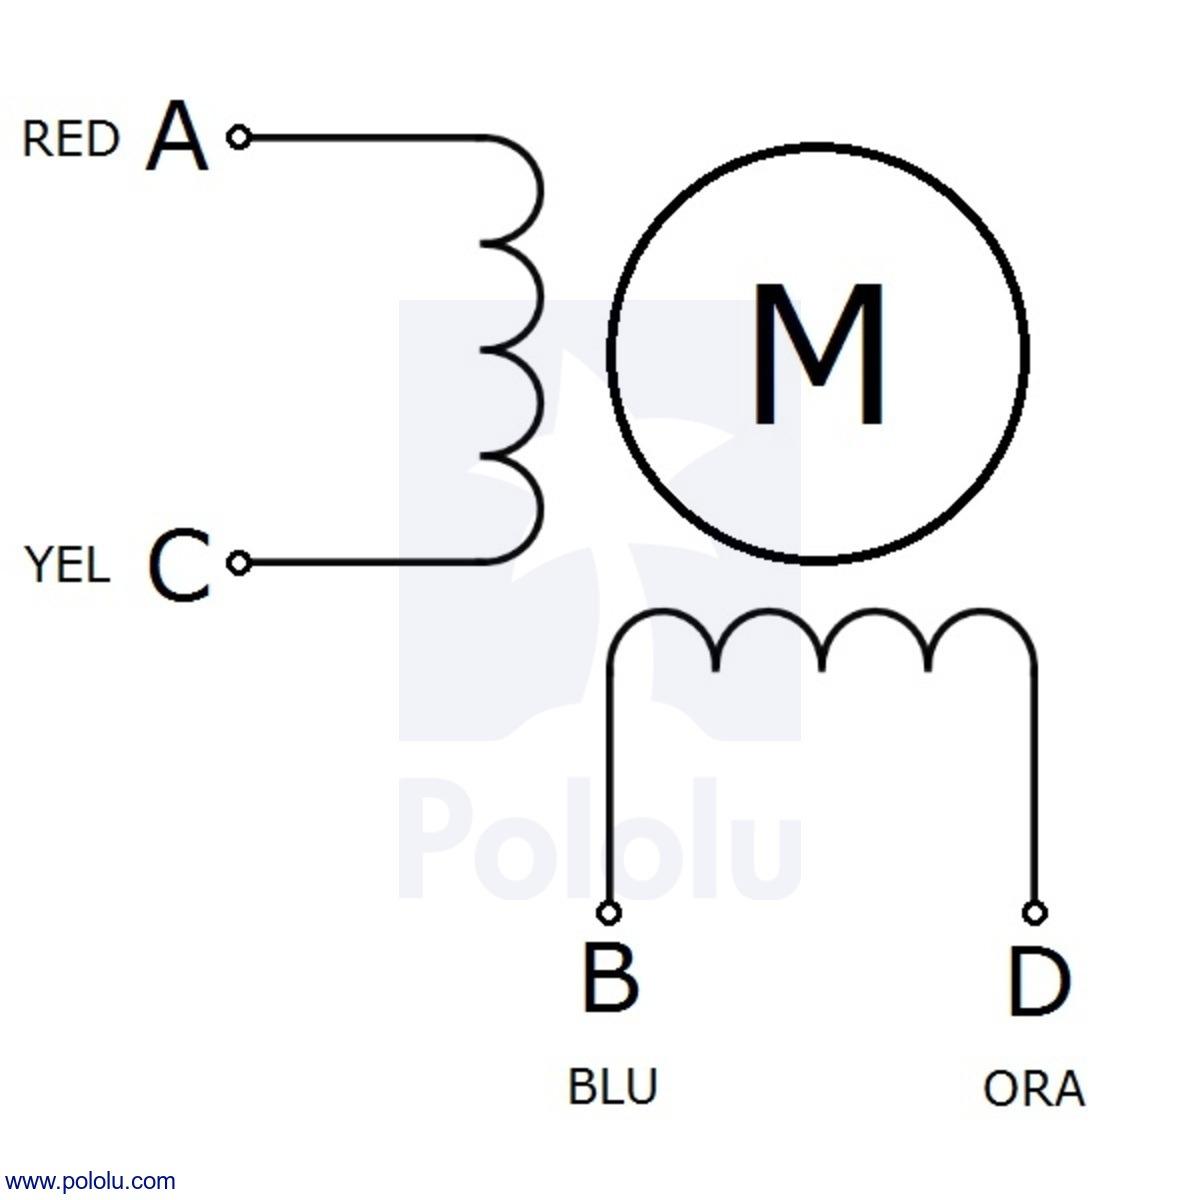 pololu sanyo miniature stepper motor bipolar 200 steps rev 14 wiring diagram rev14 [ 1200 x 1200 Pixel ]